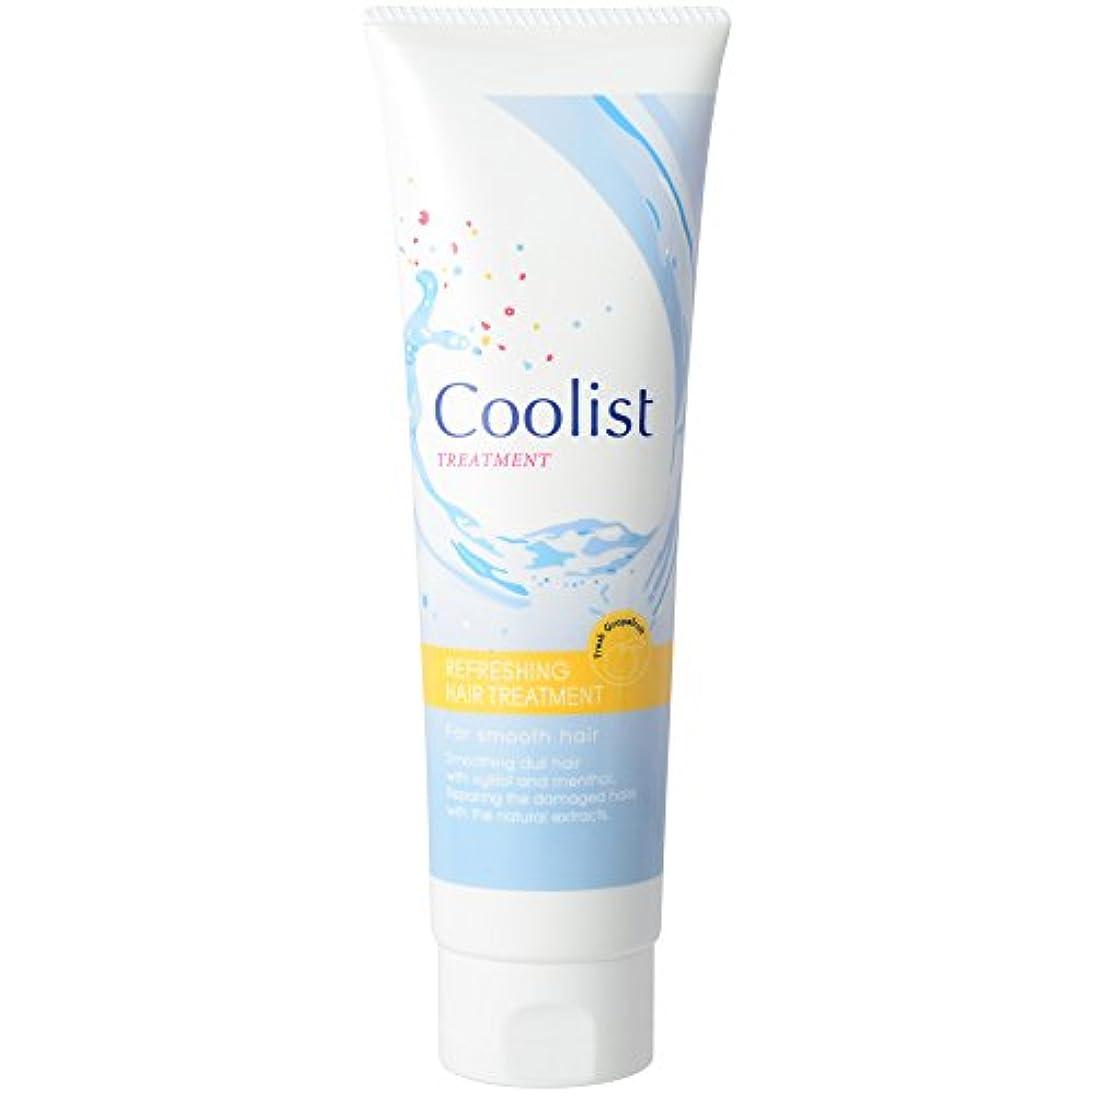 Coolist(クーリスト) クールトリートメント